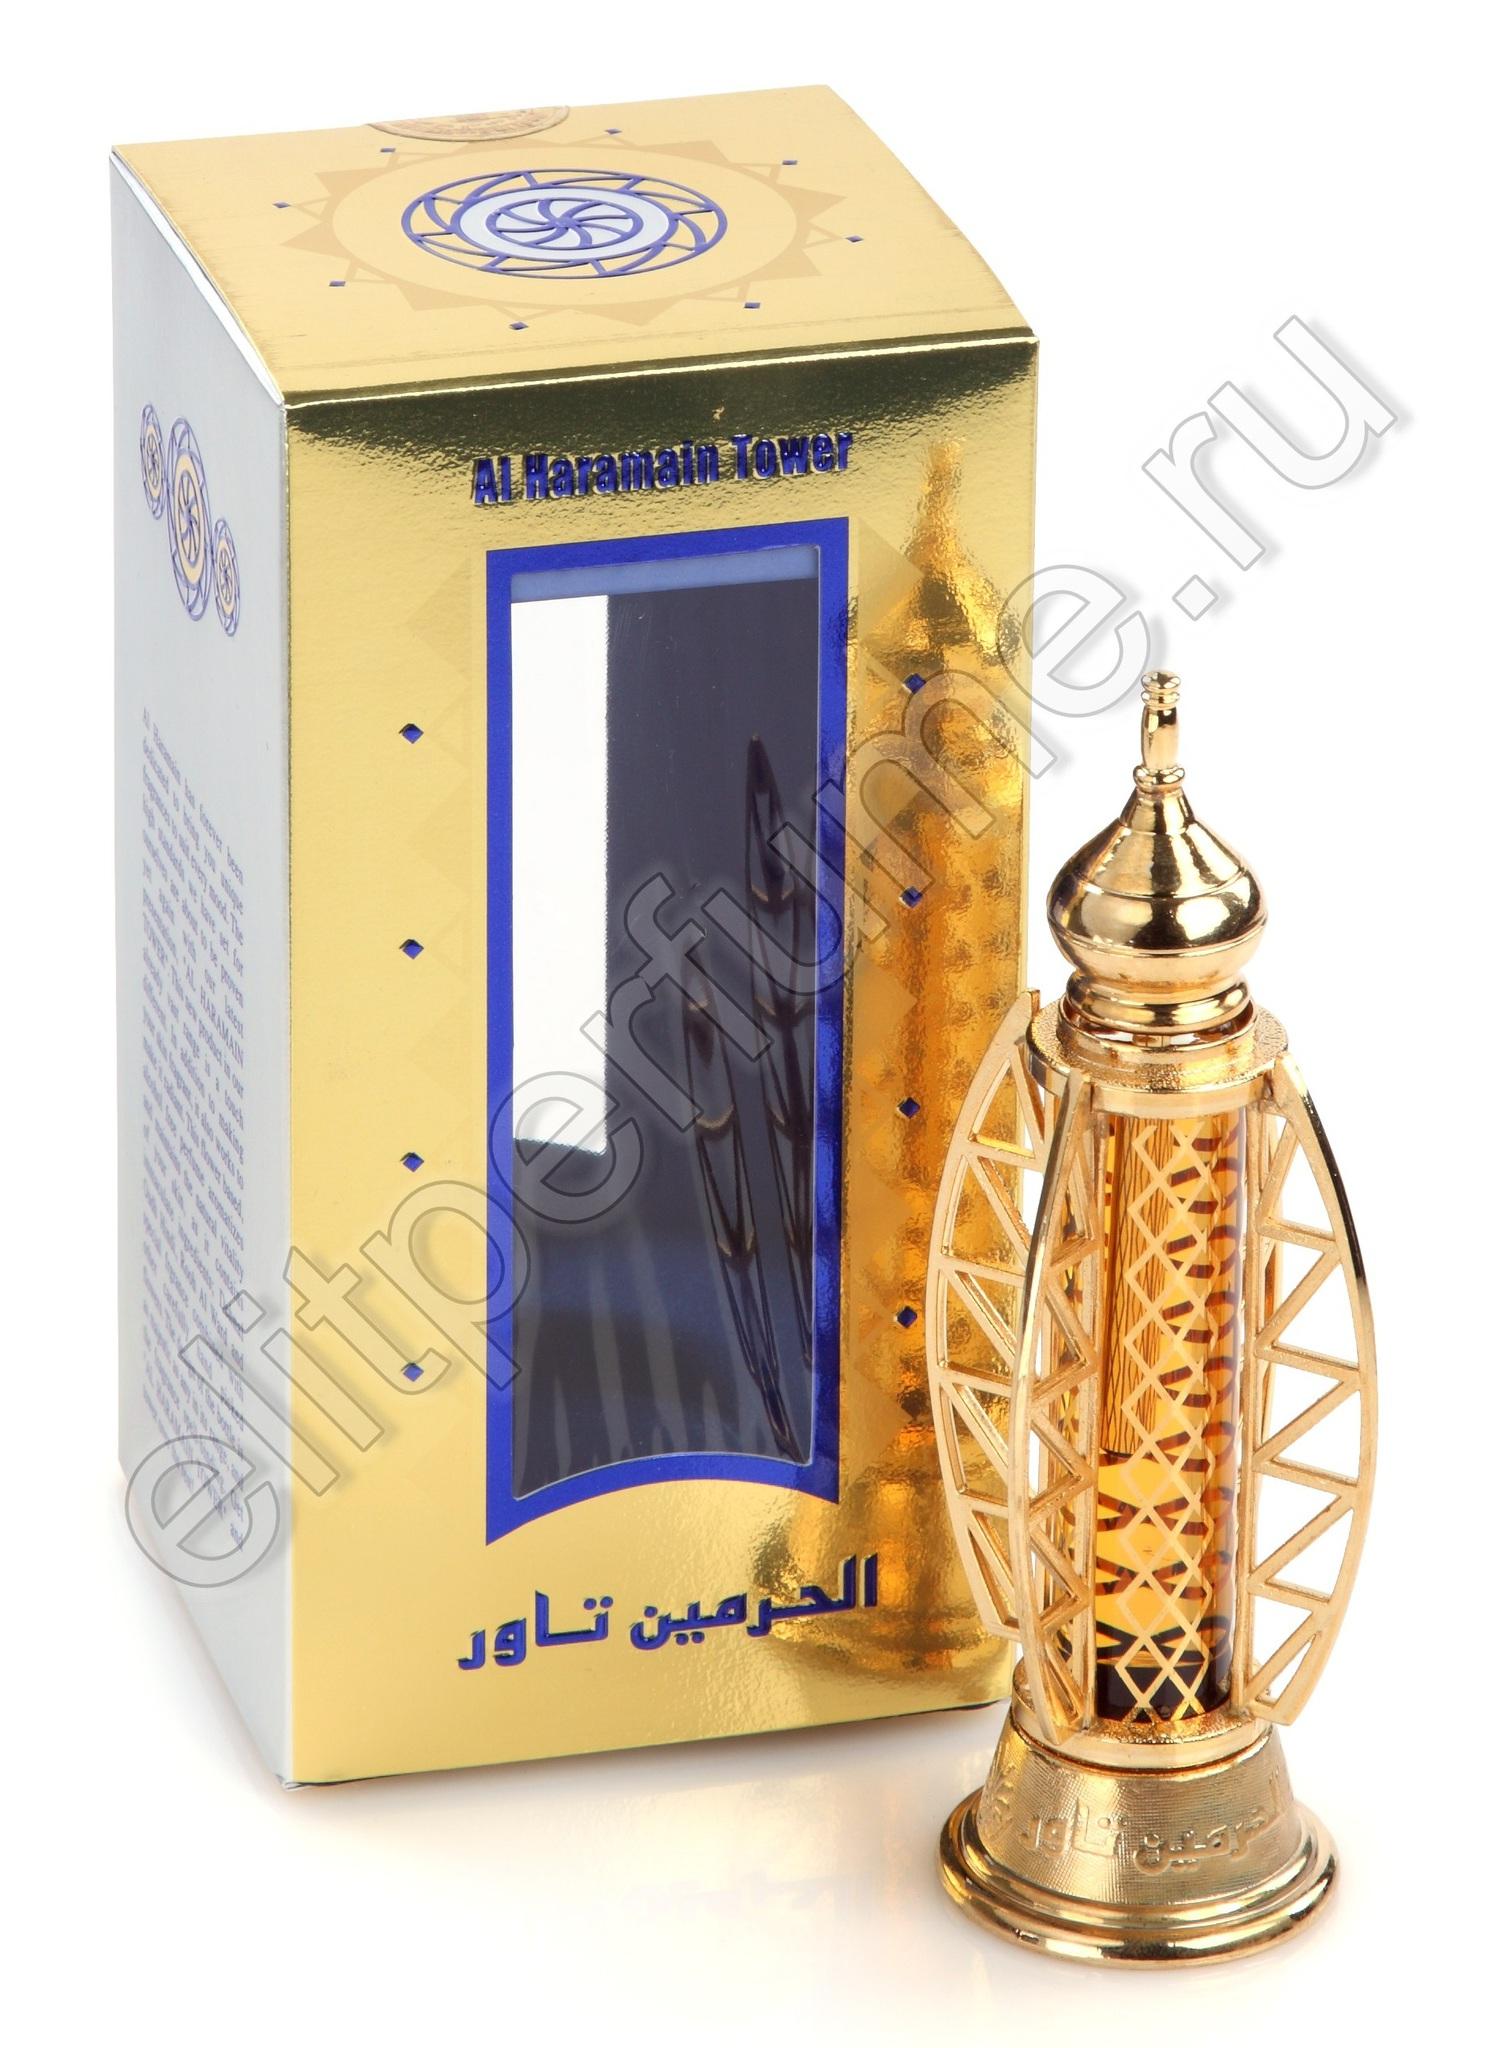 Башня Аль Харамейн Al Haramain Tower 20 мл арабские масляные духи от Аль Харамайн Al Haramain Perfumes